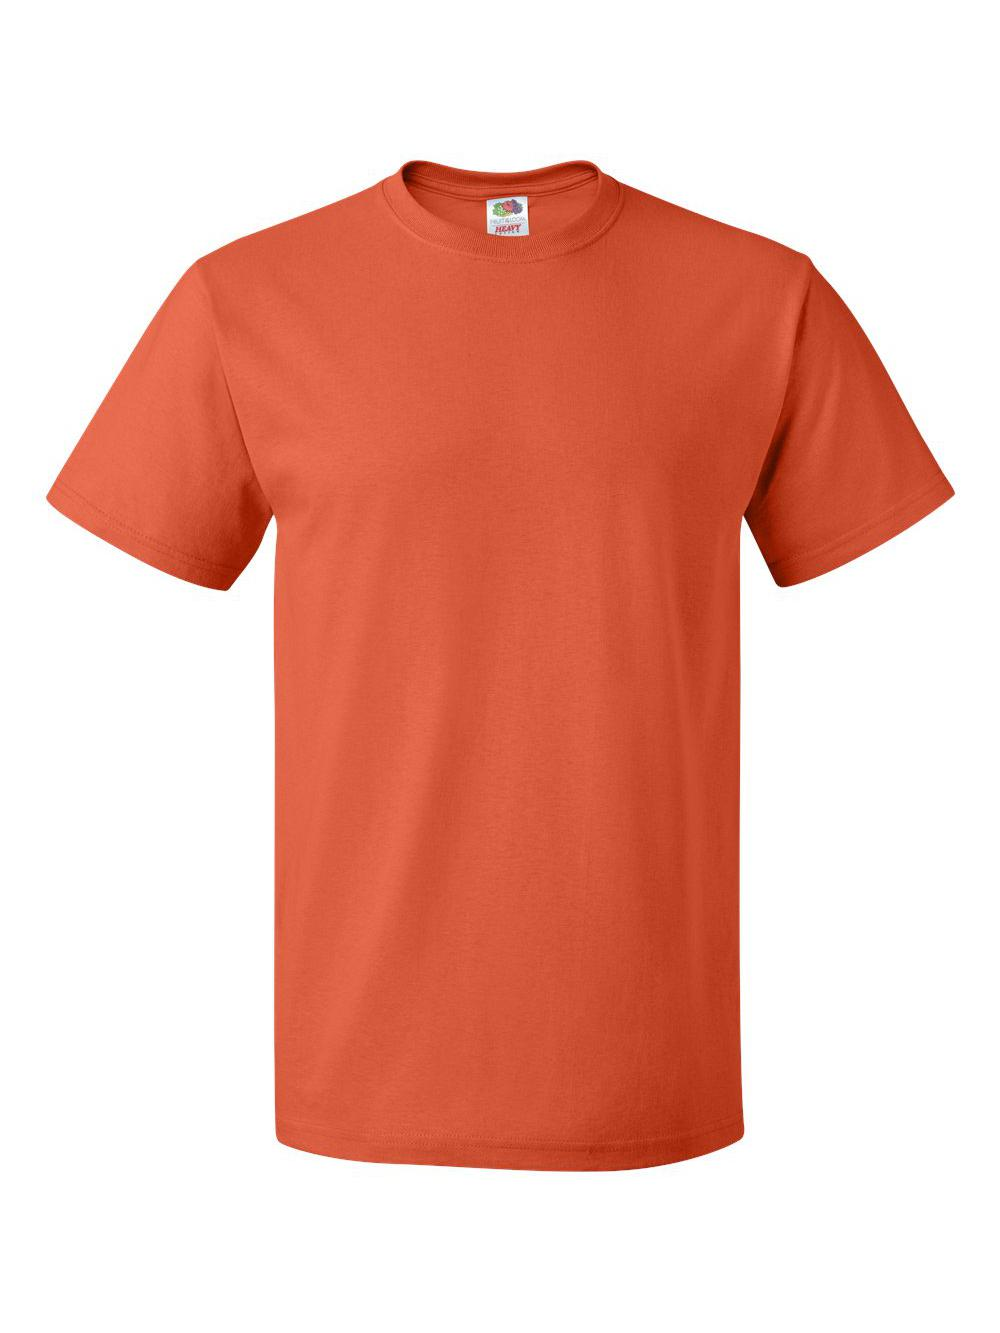 Fruit-of-the-Loom-HD-Cotton-Short-Sleeve-T-Shirt-3930R thumbnail 21